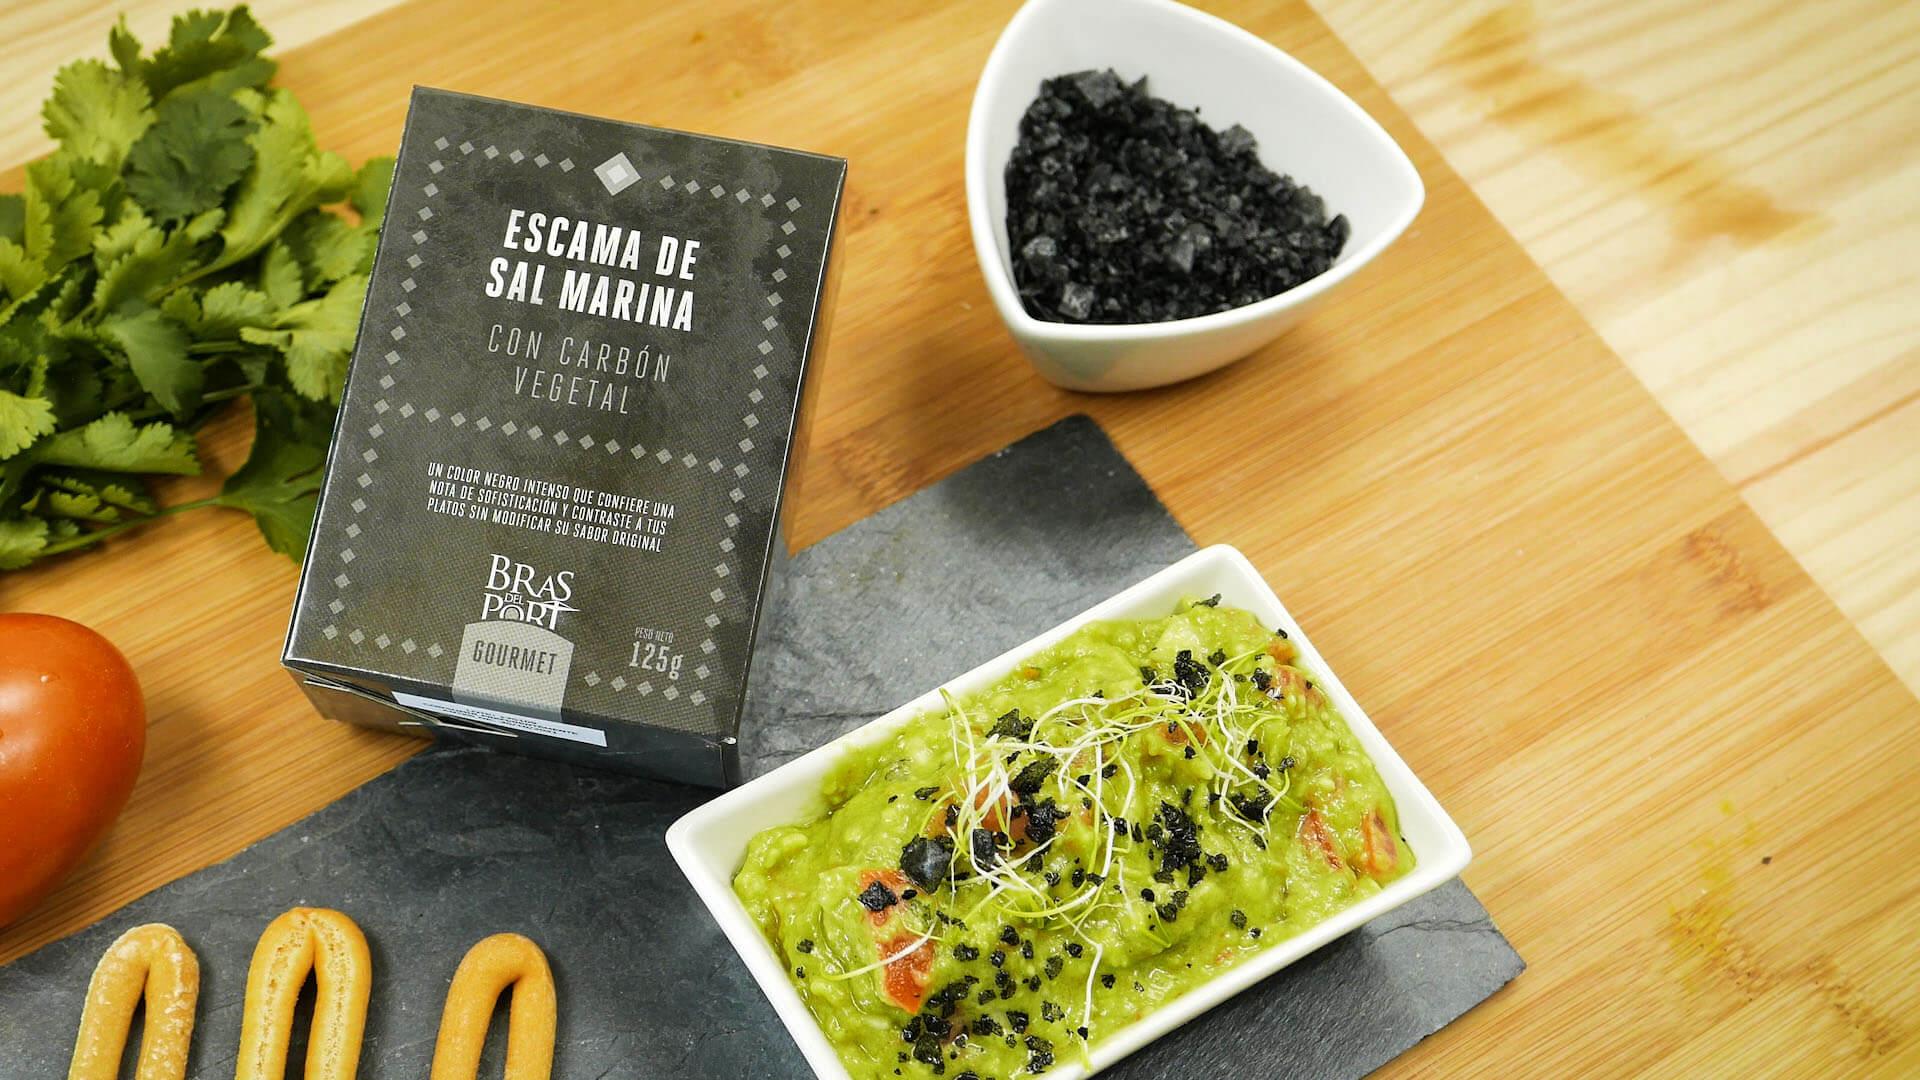 Guacamole con escamas con carbón vegetal